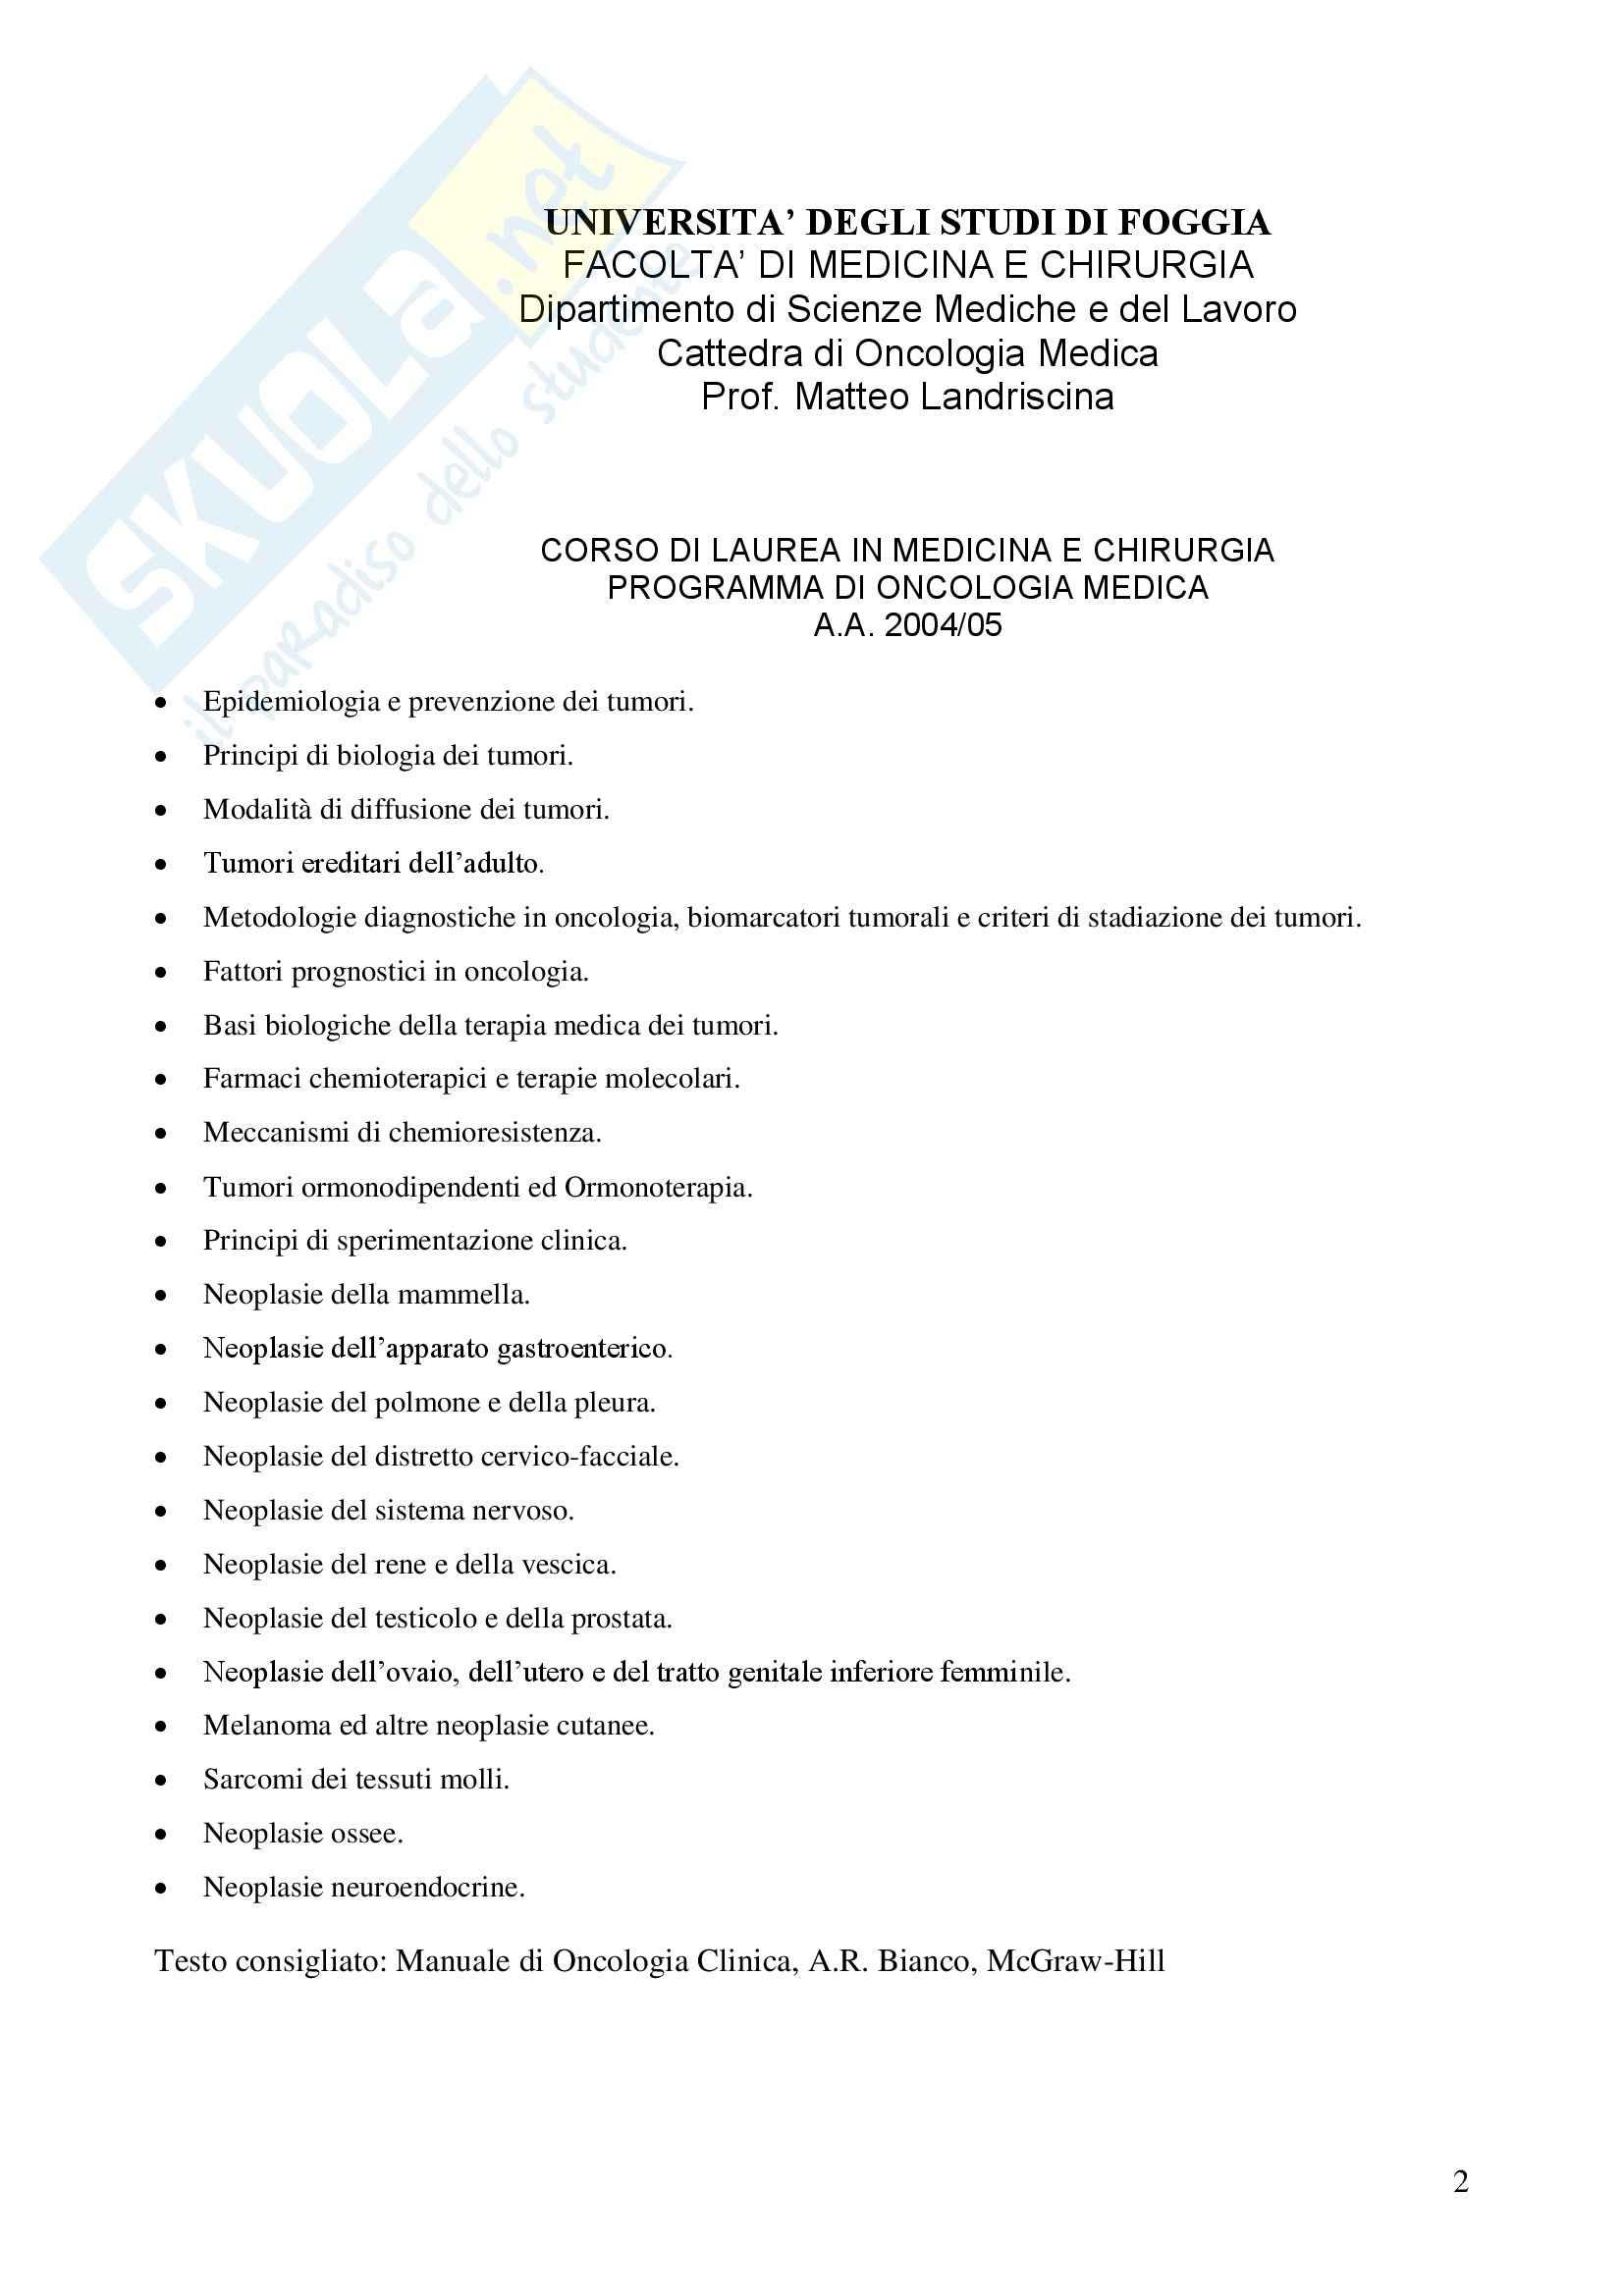 Oncologia Clinica - Dispensa Oncologia Medica-Clinica Pag. 2